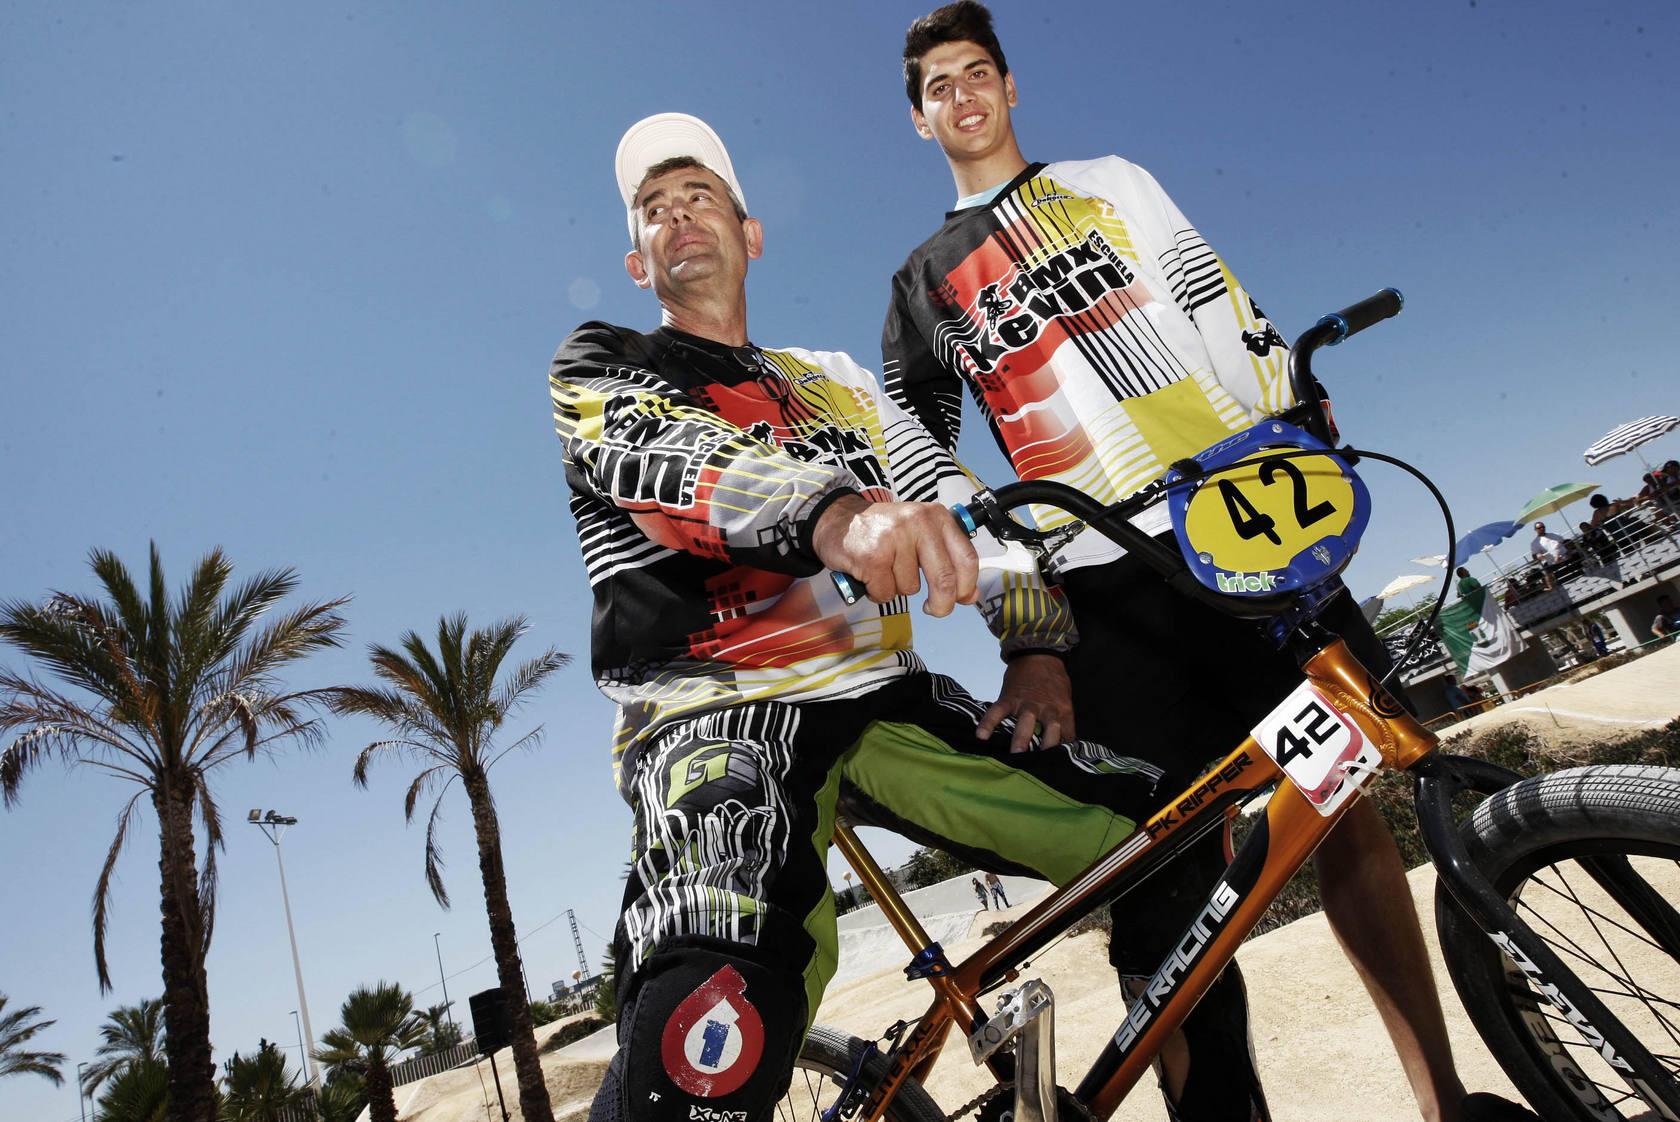 Segunda jornada del Campeonato de España de BMX